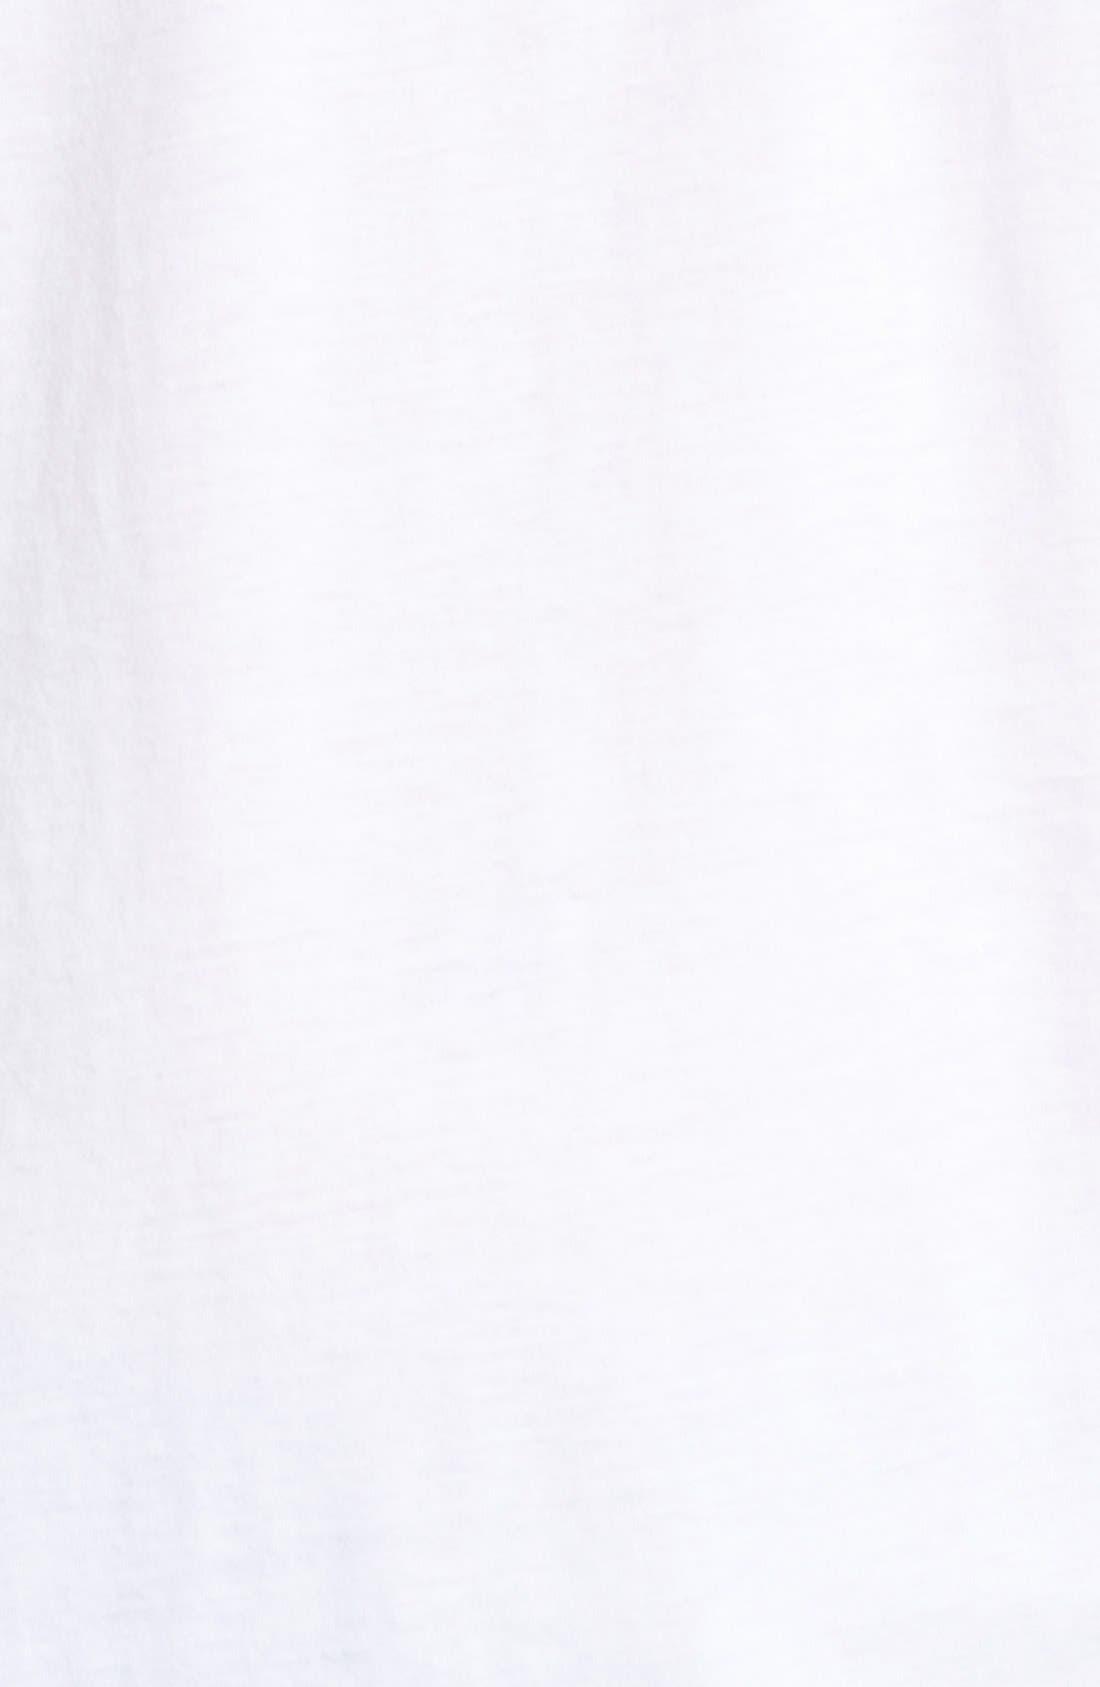 Alternate Image 5  - Cutter & Buck 'Sida' V-Neck T-Shirt (Big & Tall)